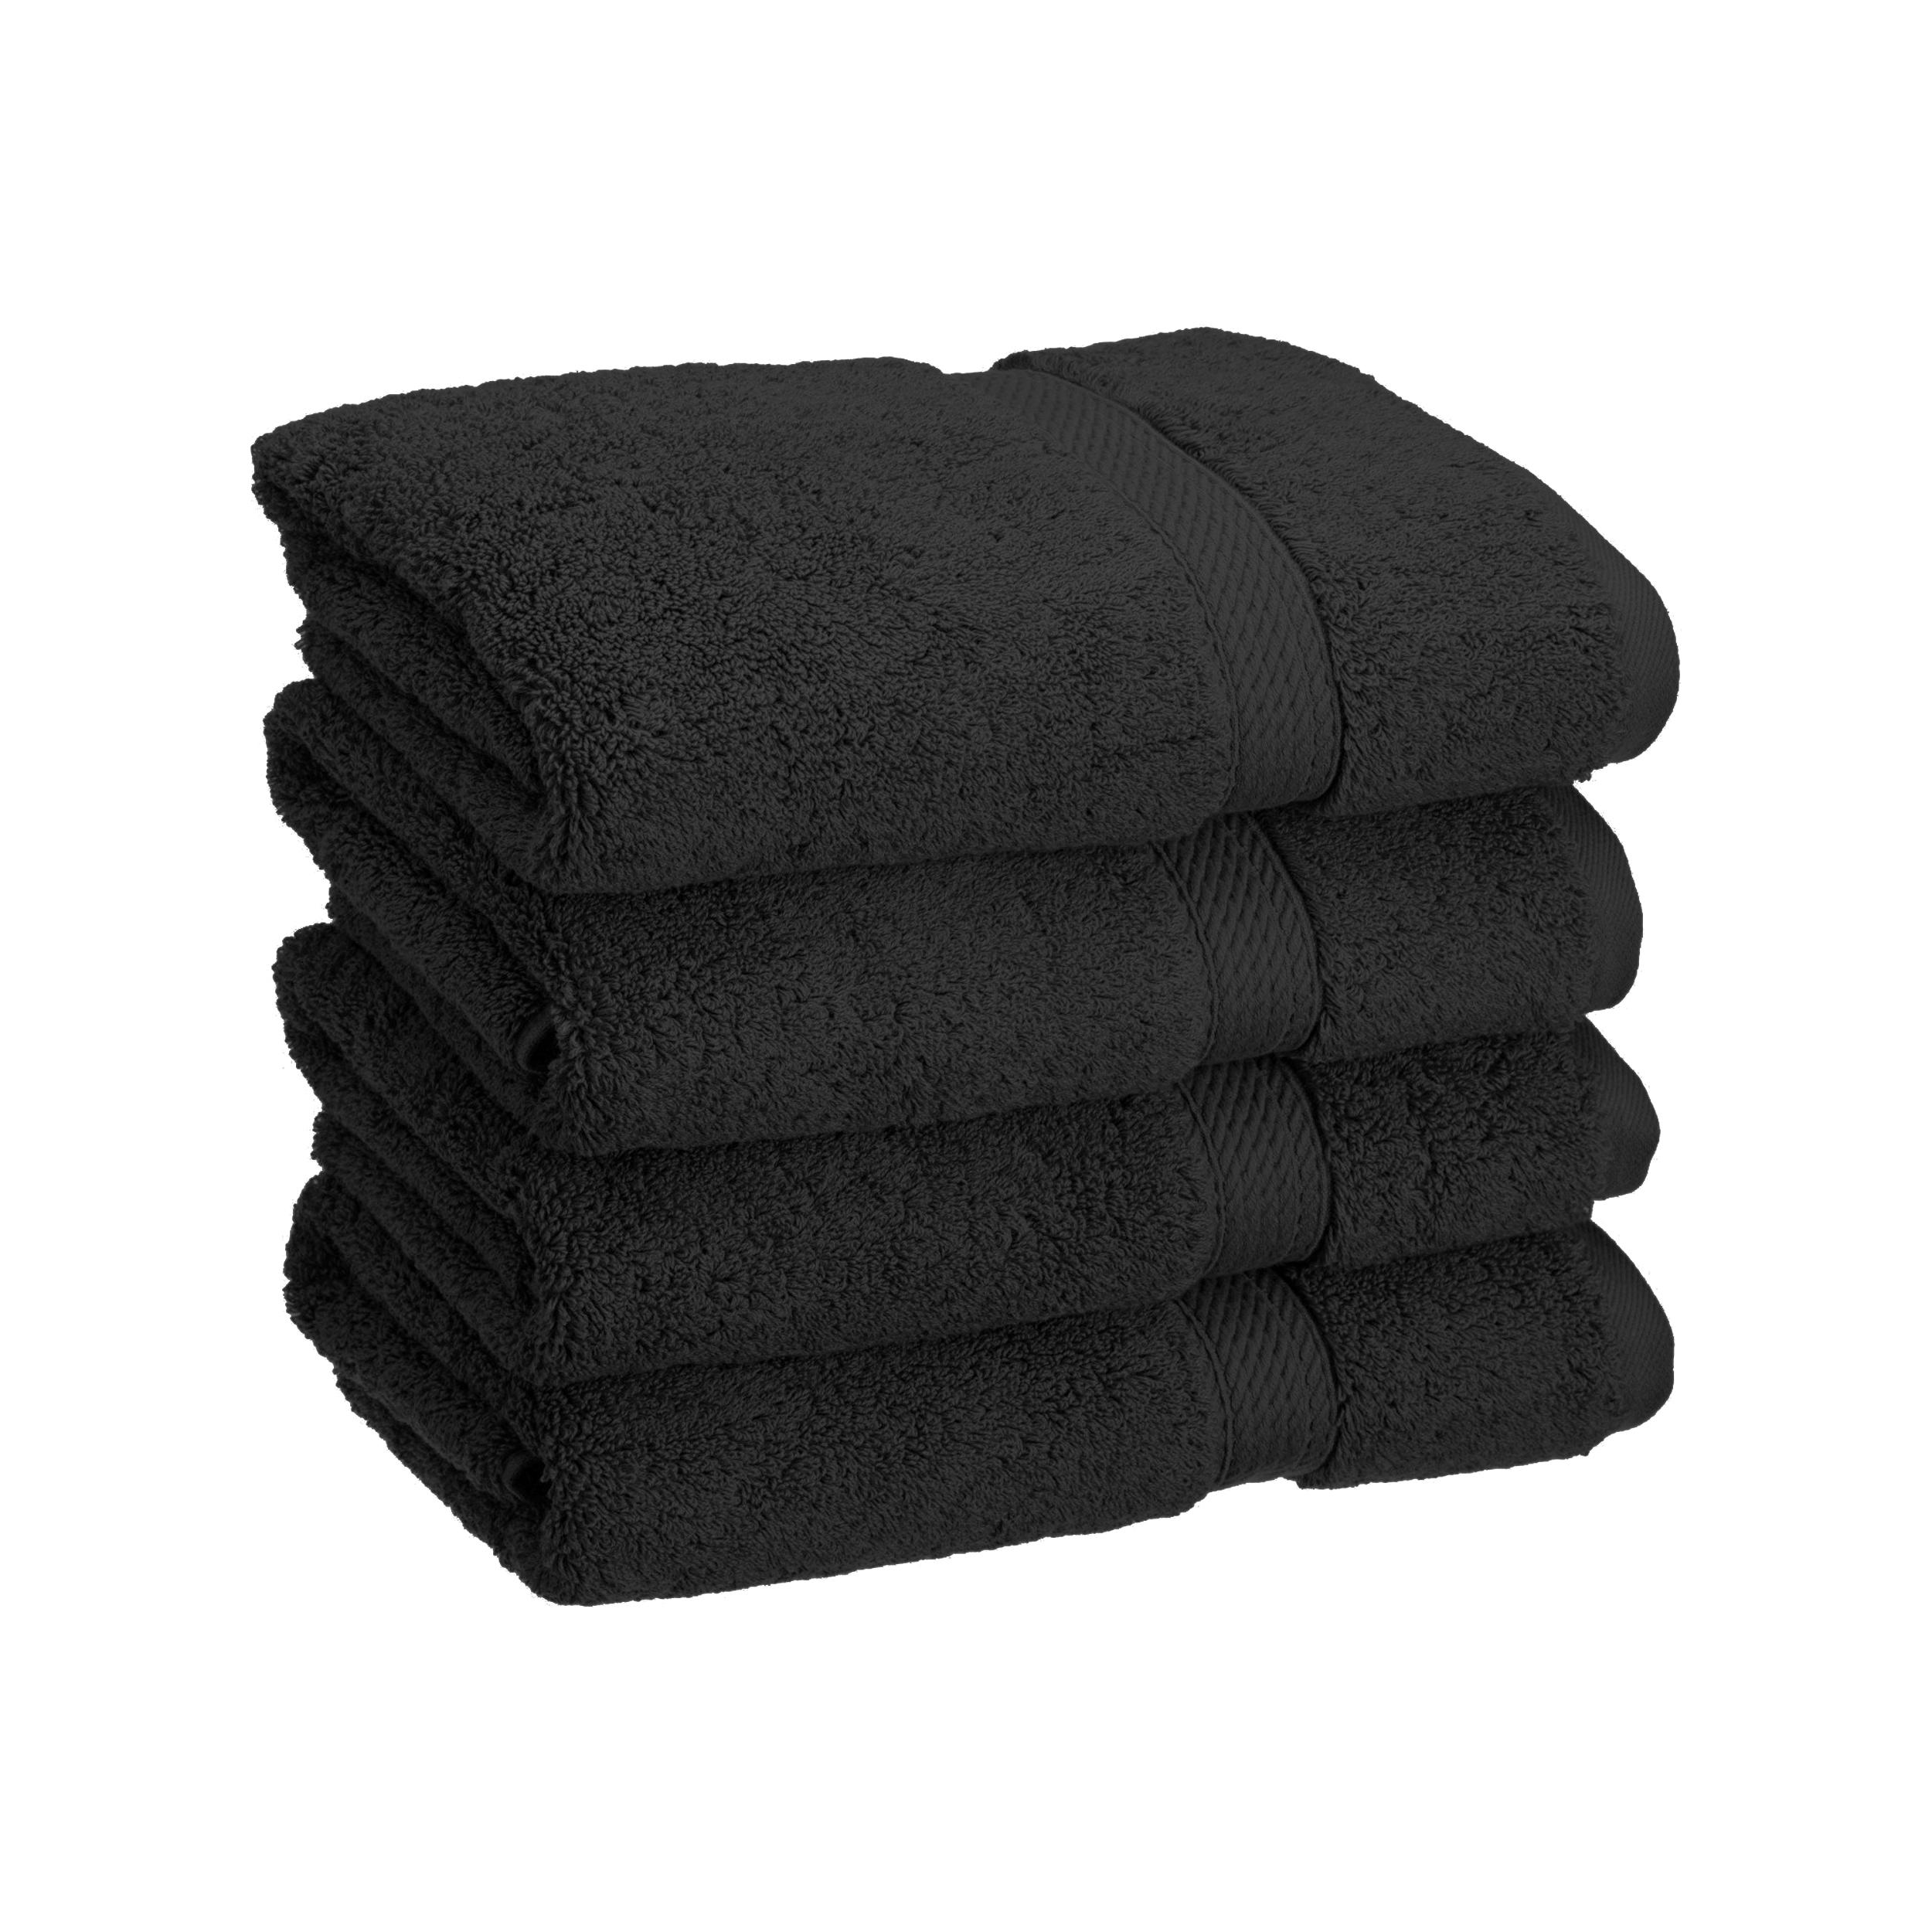 Superior 900GSM Long Stapled Combed Cotton 4-Piece Hand Towel Set